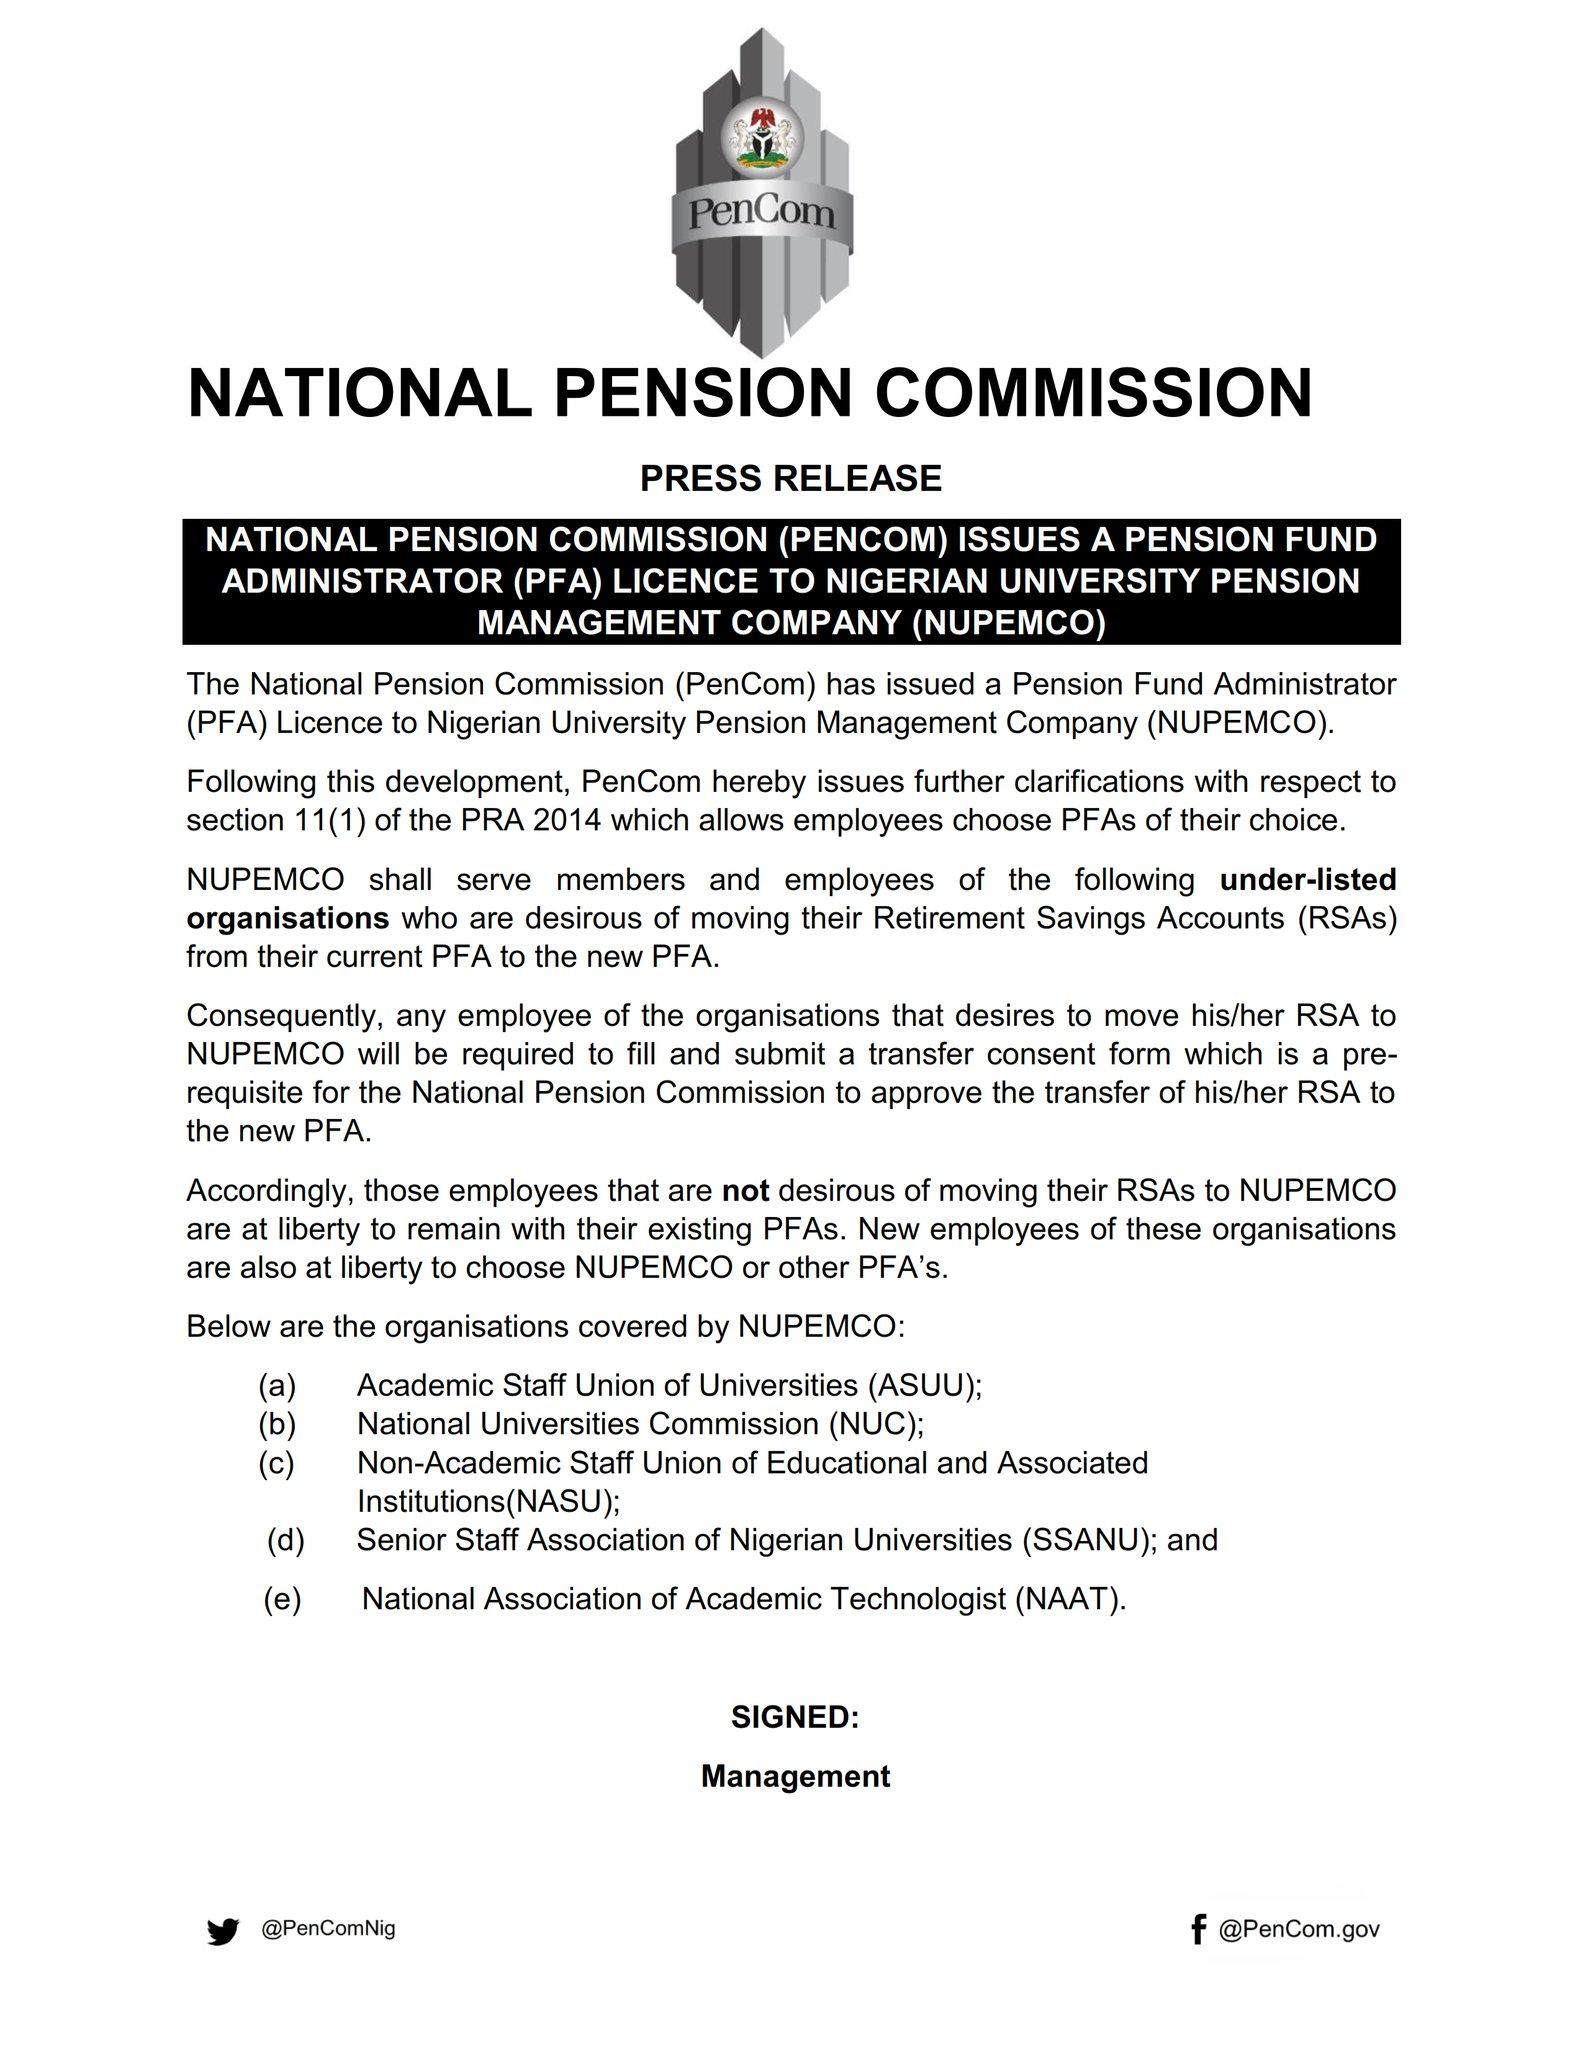 NUPEMCO Obtains PenCom Licence to Operate PFA